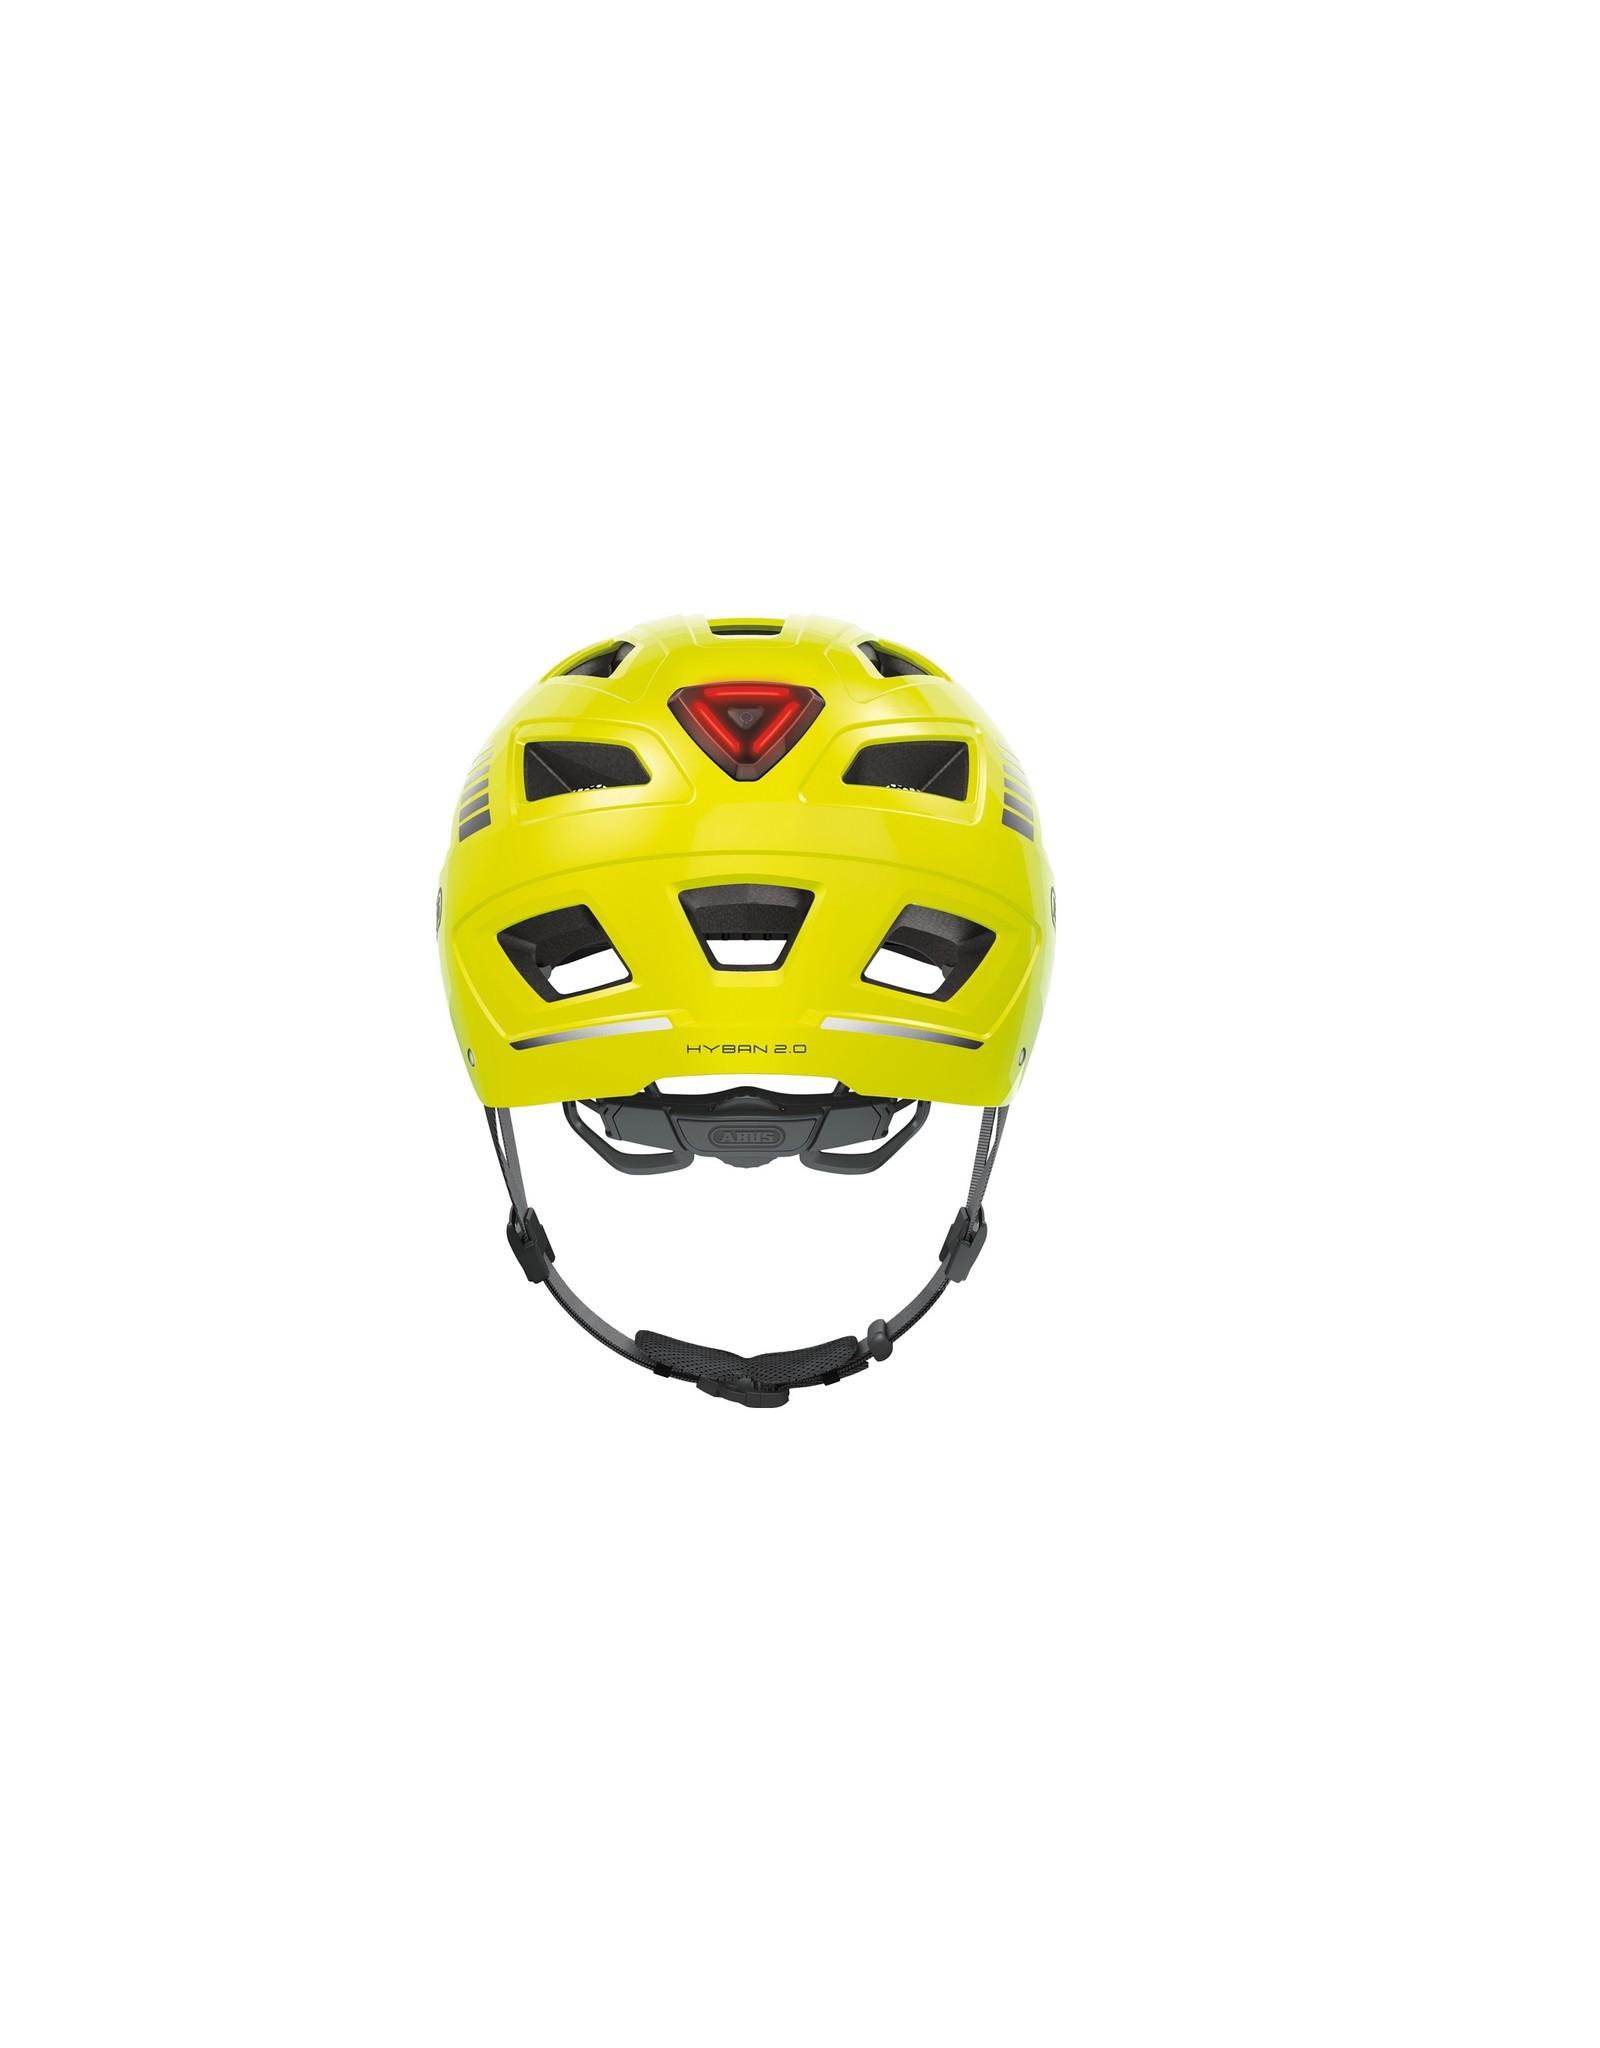 Abus Helmet - Abus Hyban 2.0